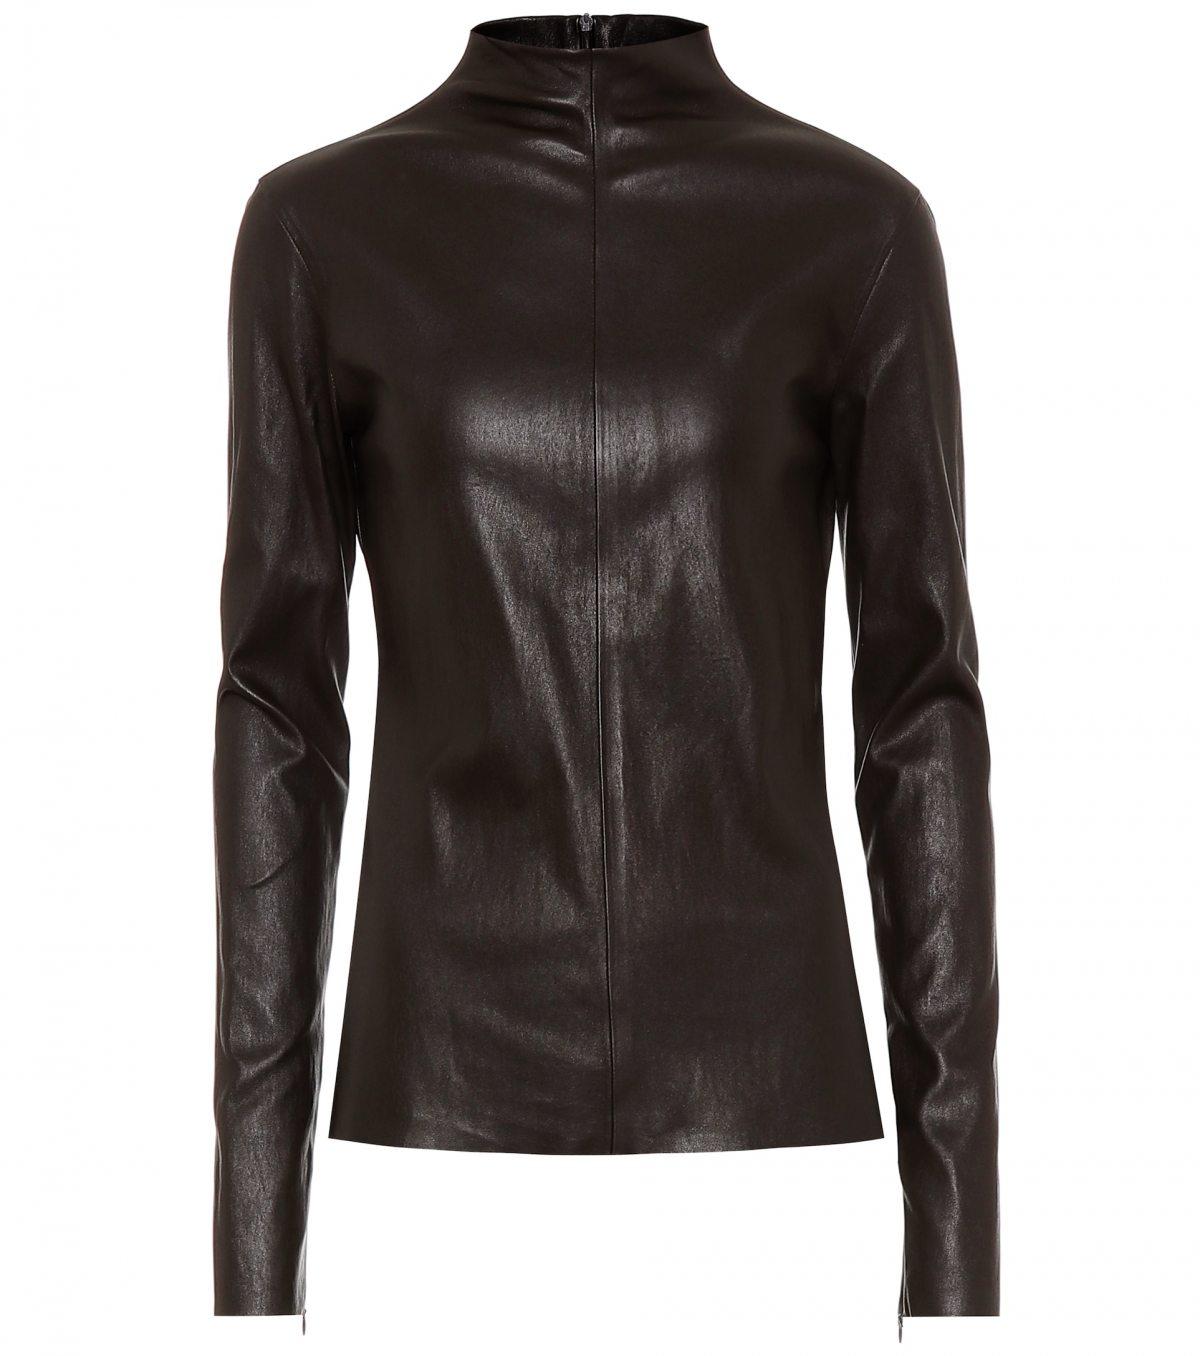 Leather Top by Bottega Veneta, available on mytheresa.com for EUR1639 Kim Kardashian Top Exact Product